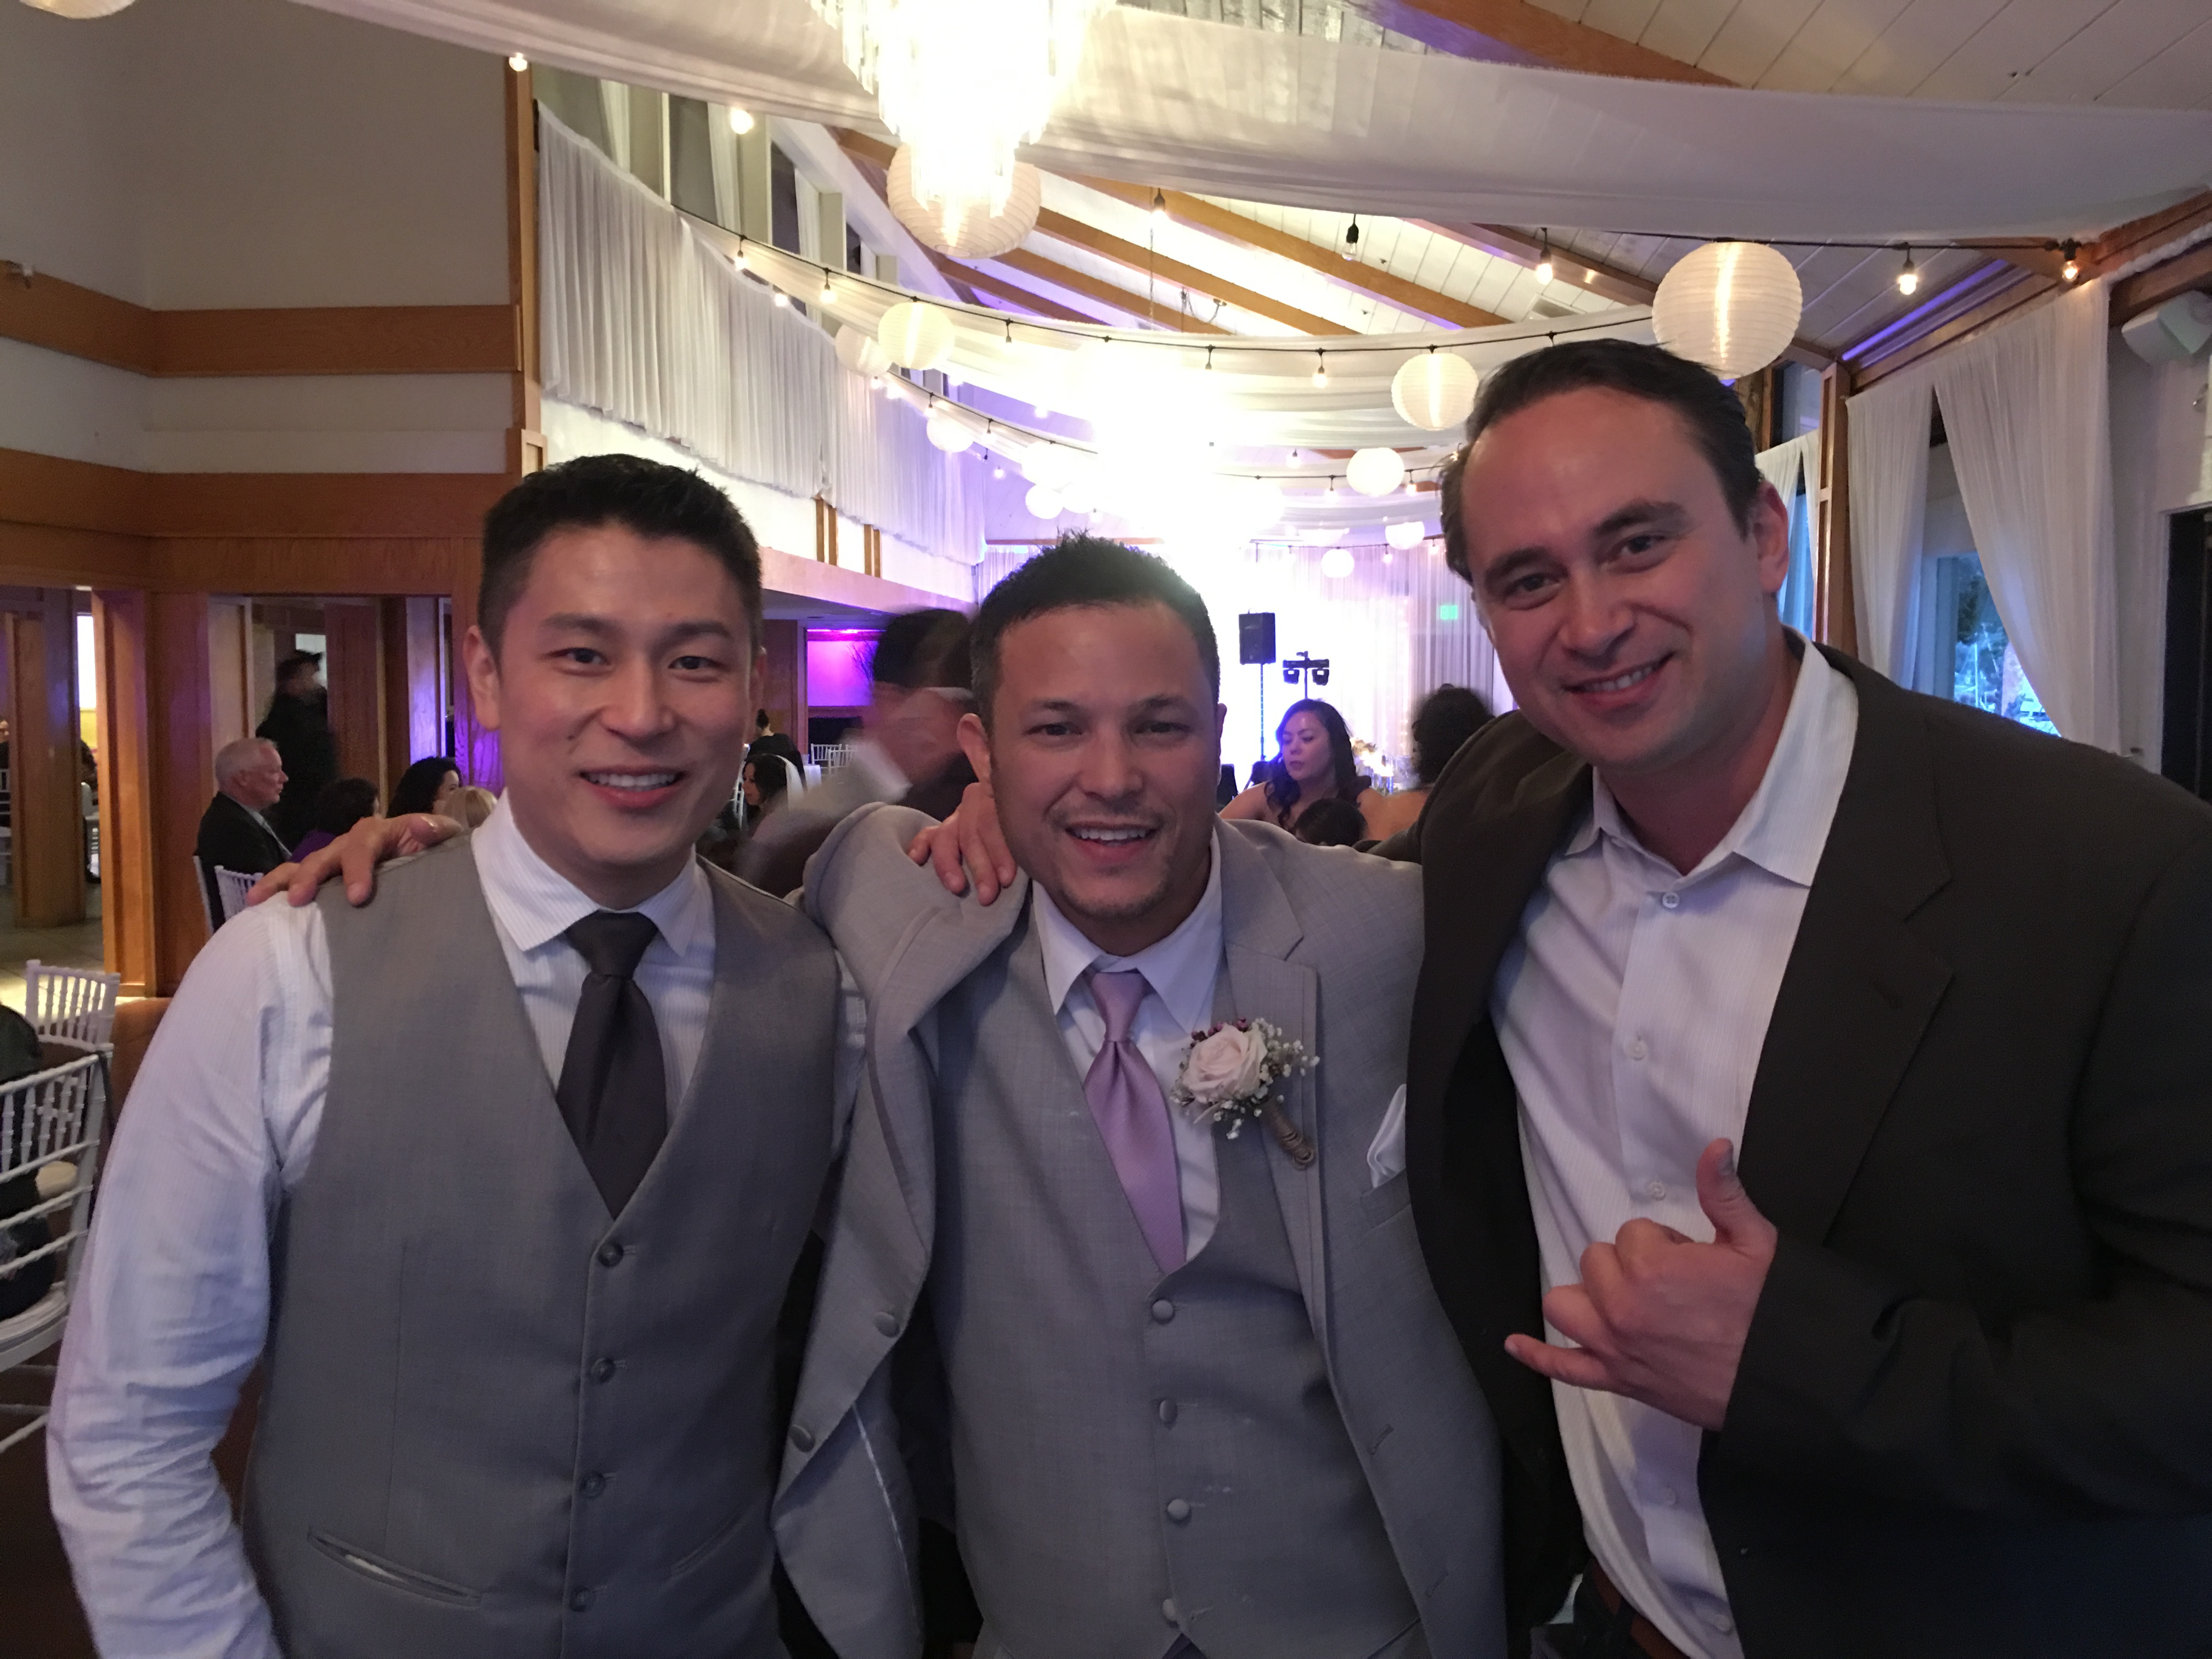 Is Microsoft Teams HIPAA Compliant? - Jerry Wu, Eddie Waits, Hoala Greevy